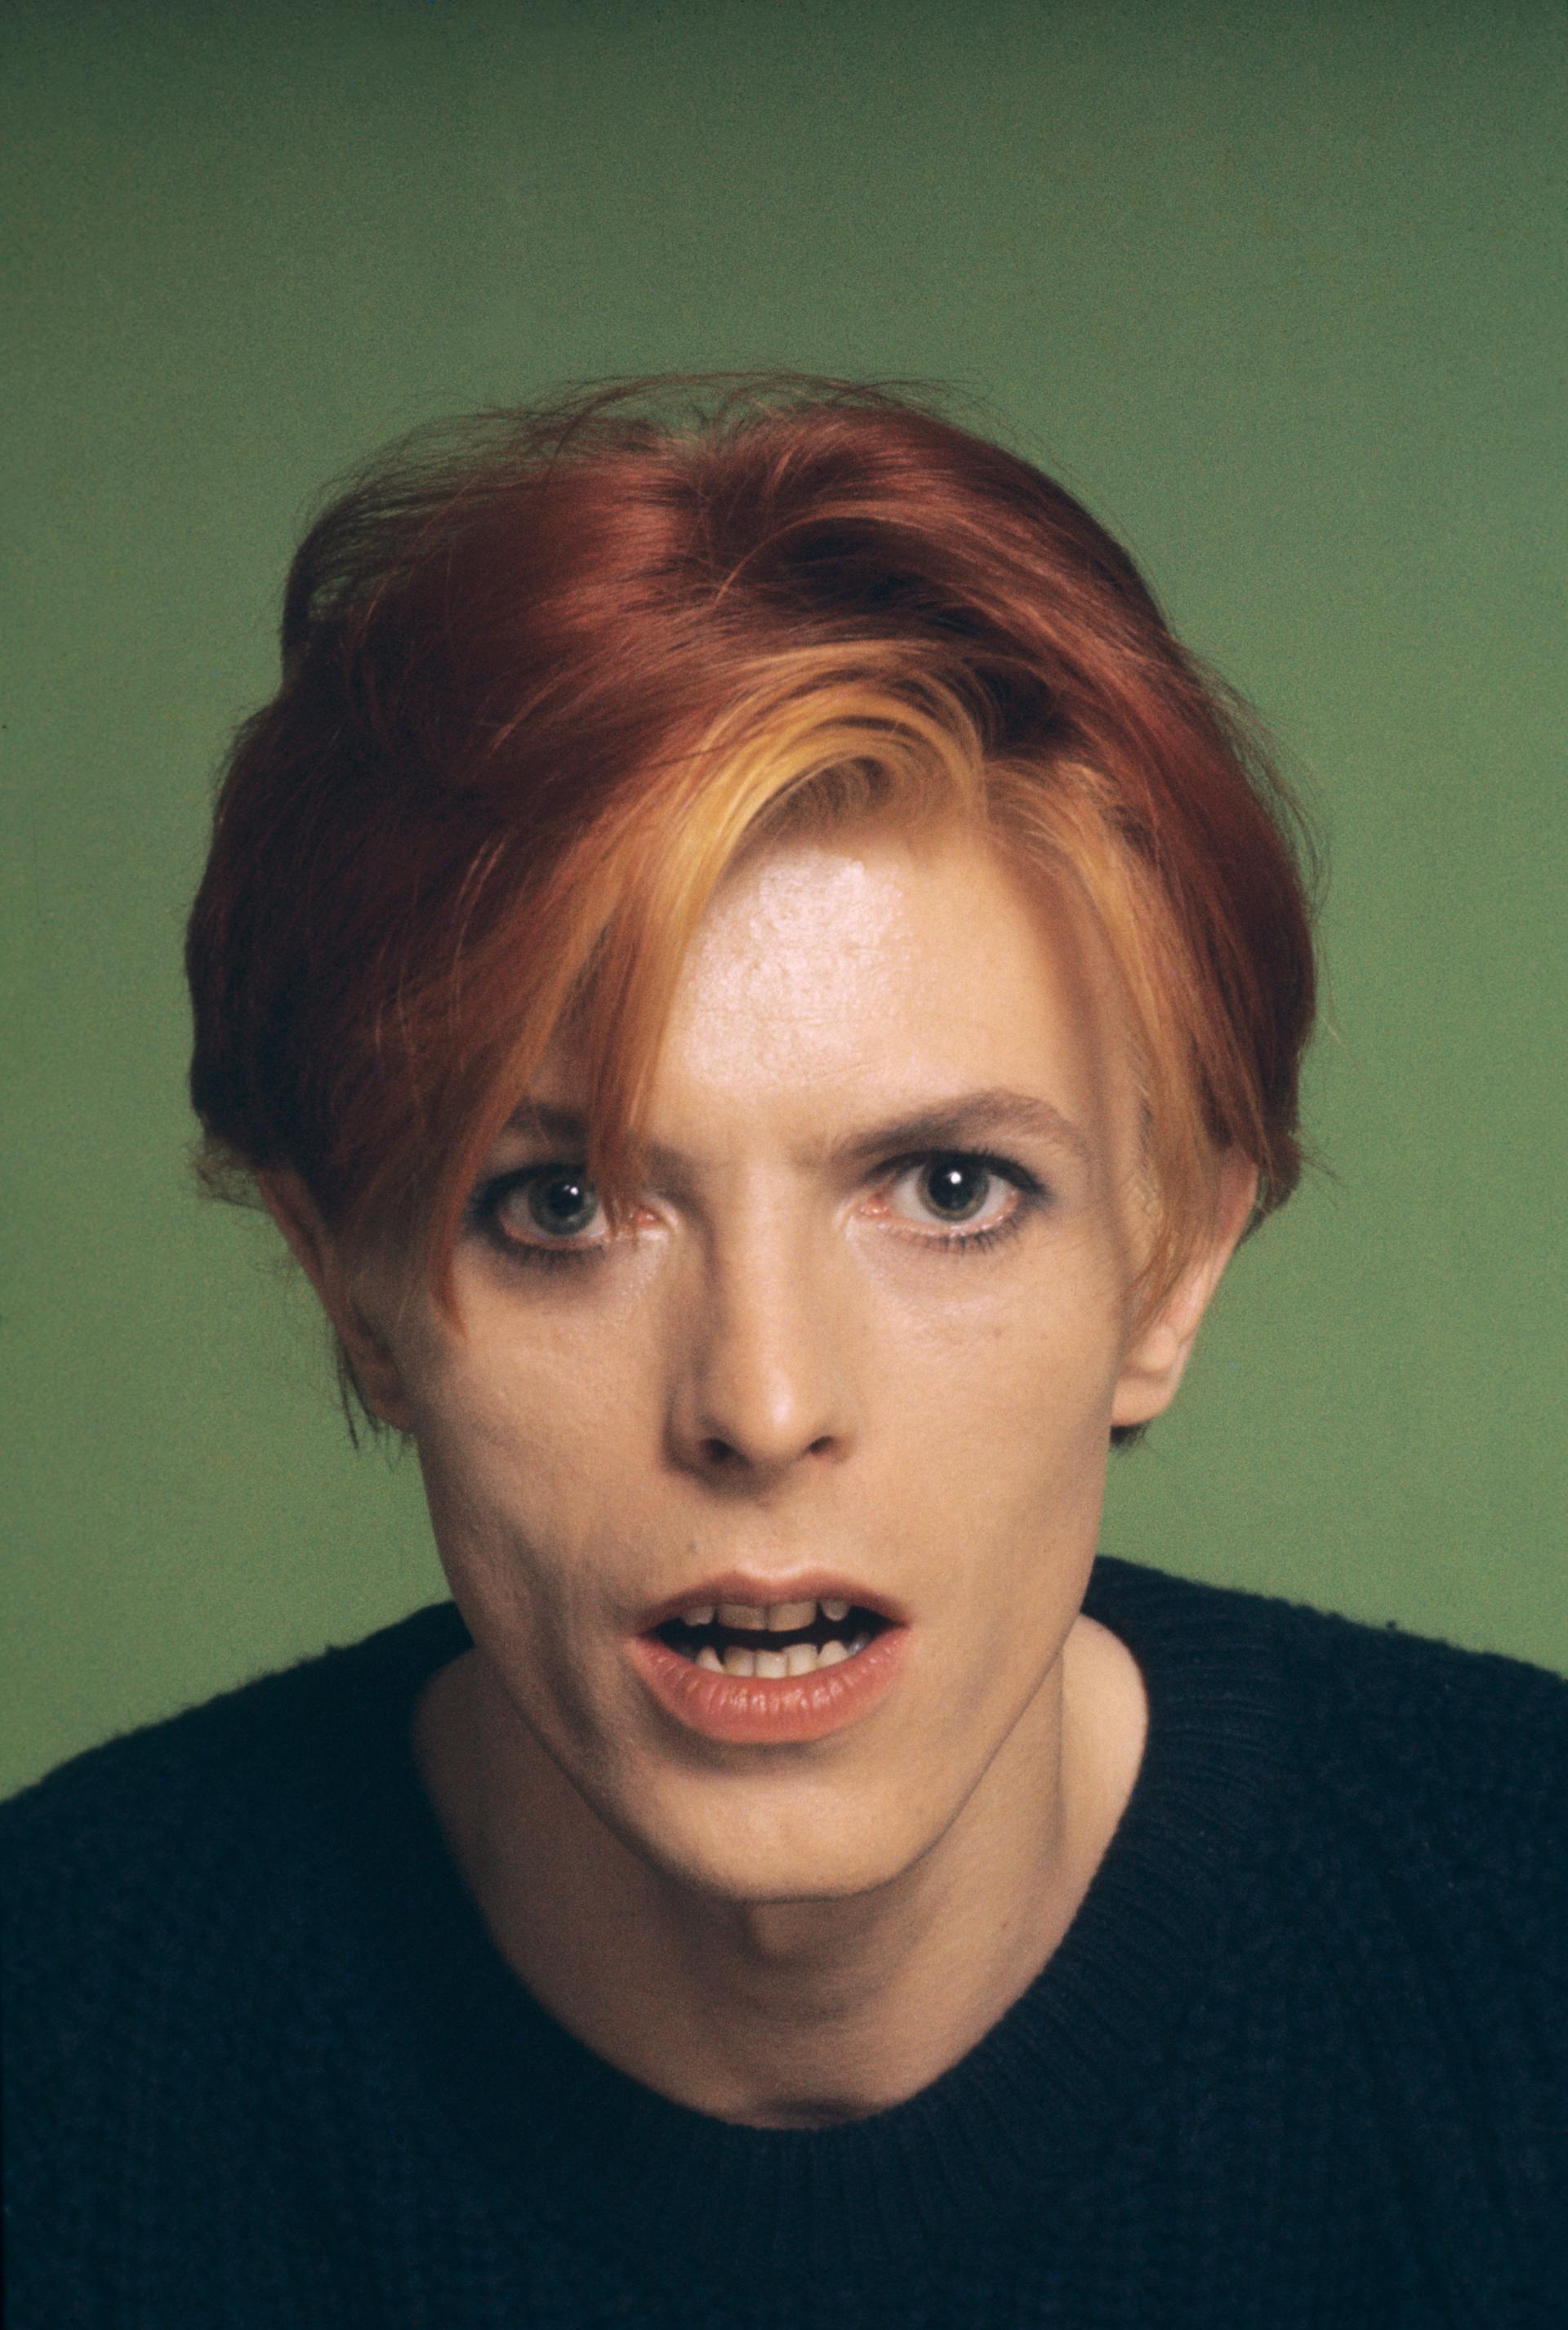 1976 --- David Bowie --- Image by © Steve Schapiro/Corbis